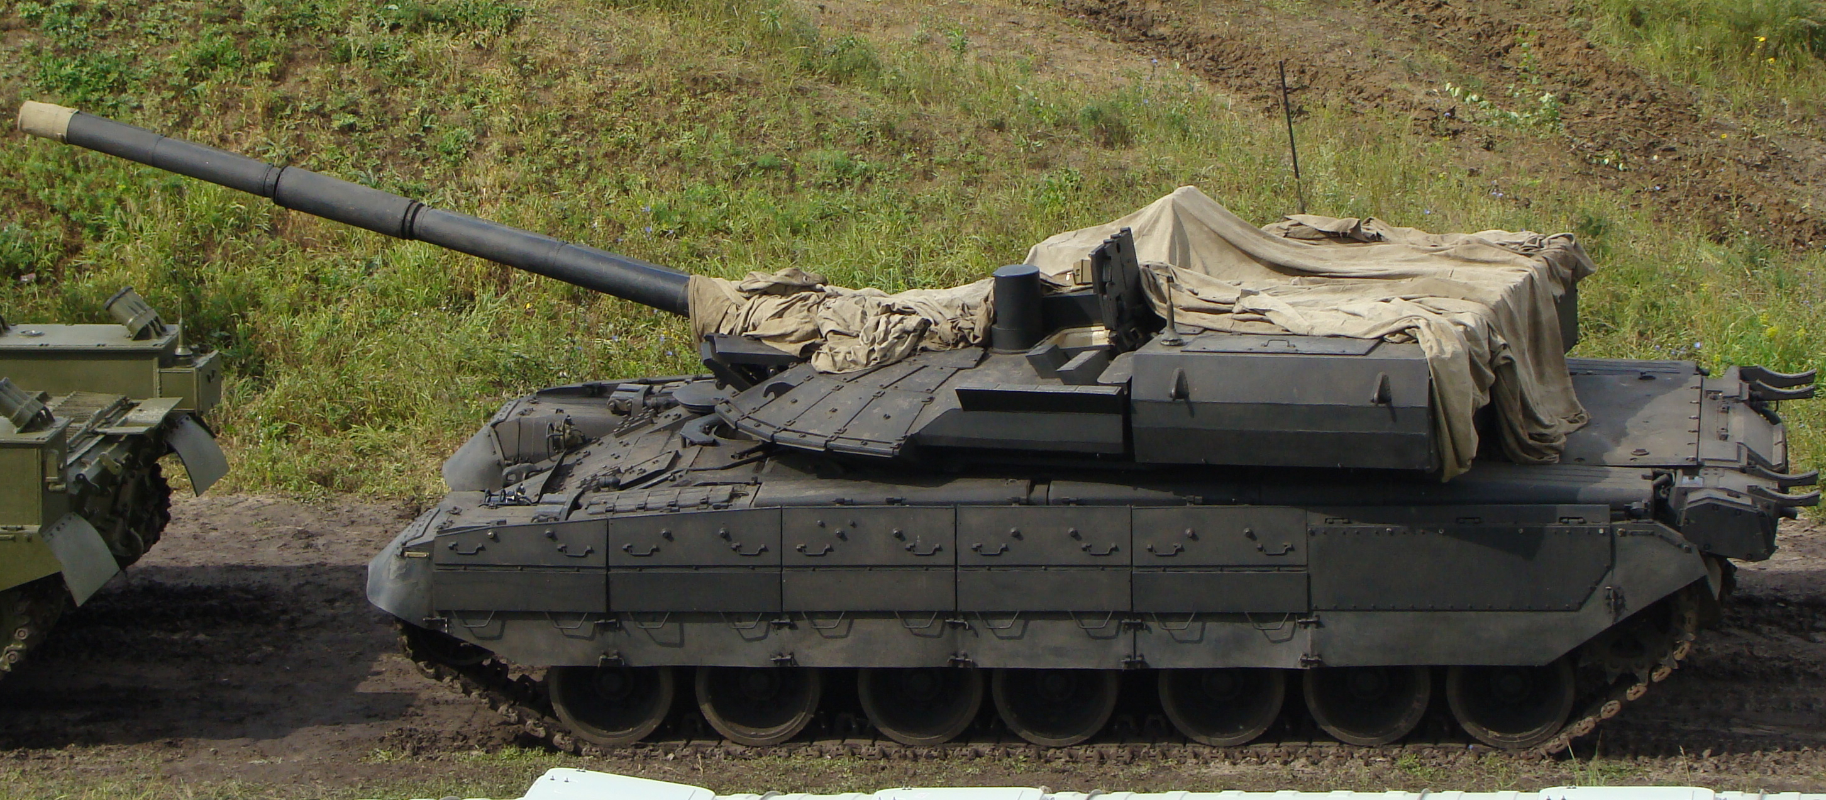 Bat ngo xuat hien phien ban xe tang T-80 manh ngang voi T-14 Armata-Hinh-7